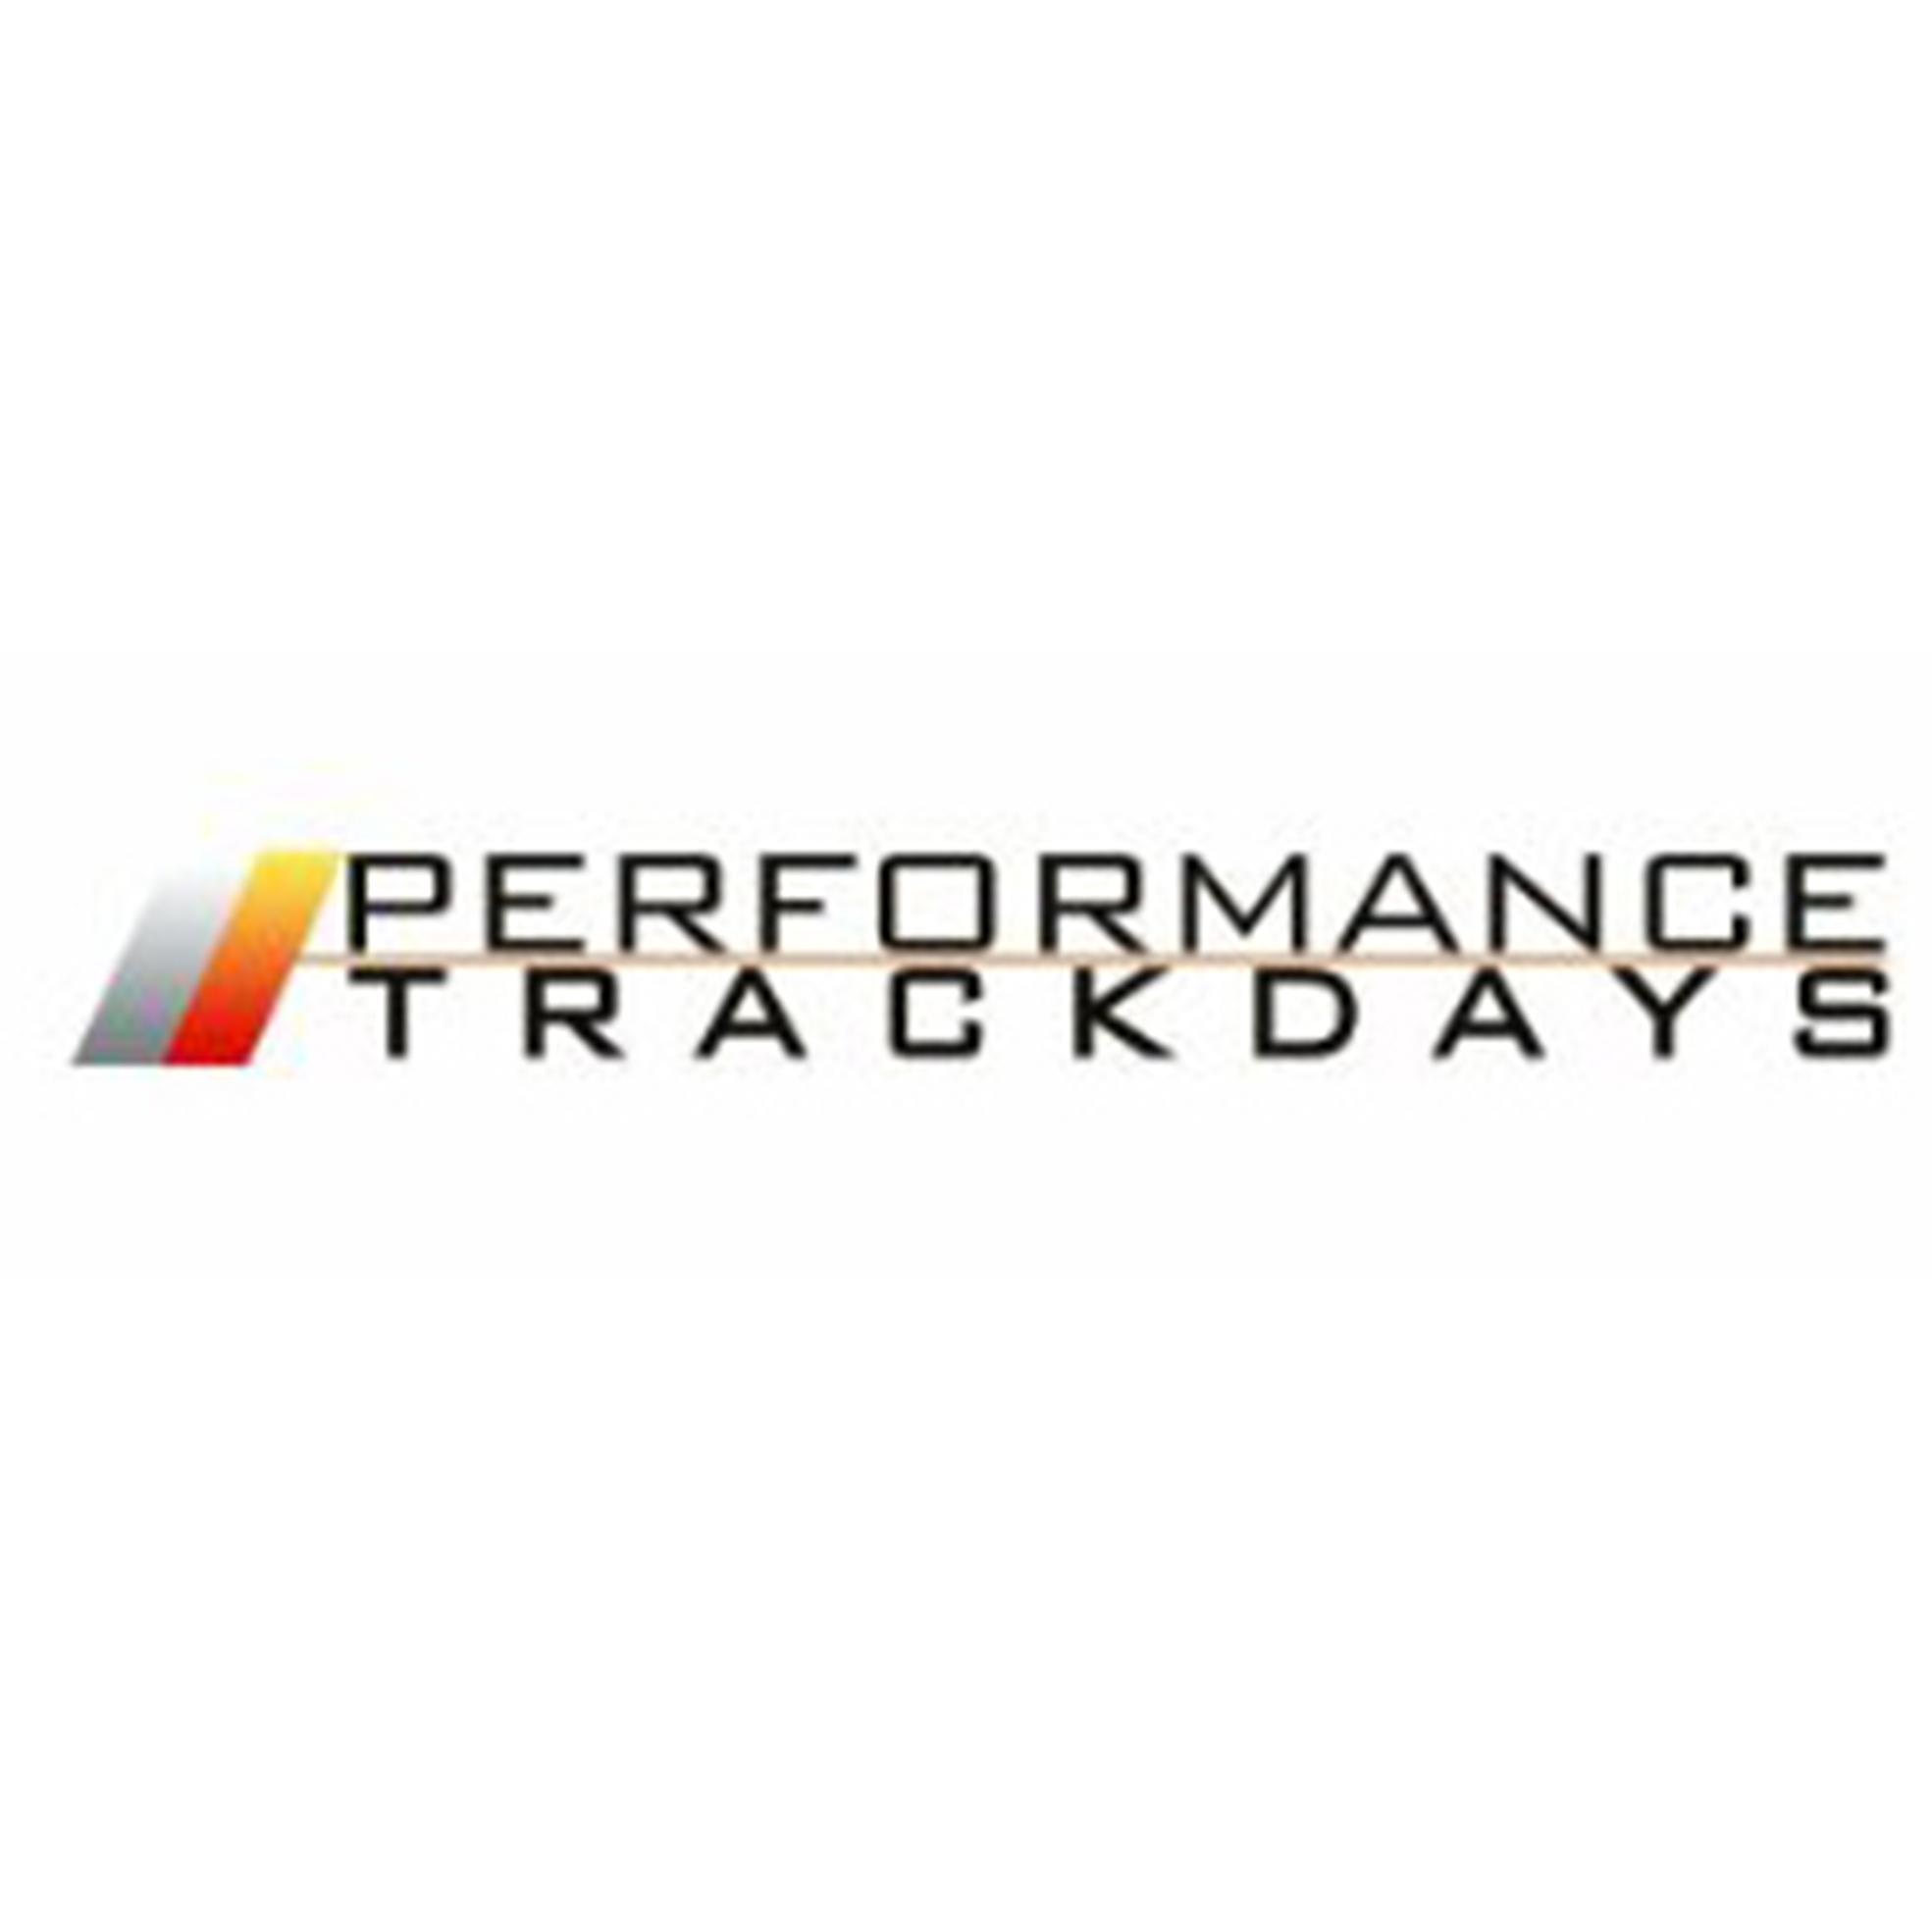 Performance Trackdays